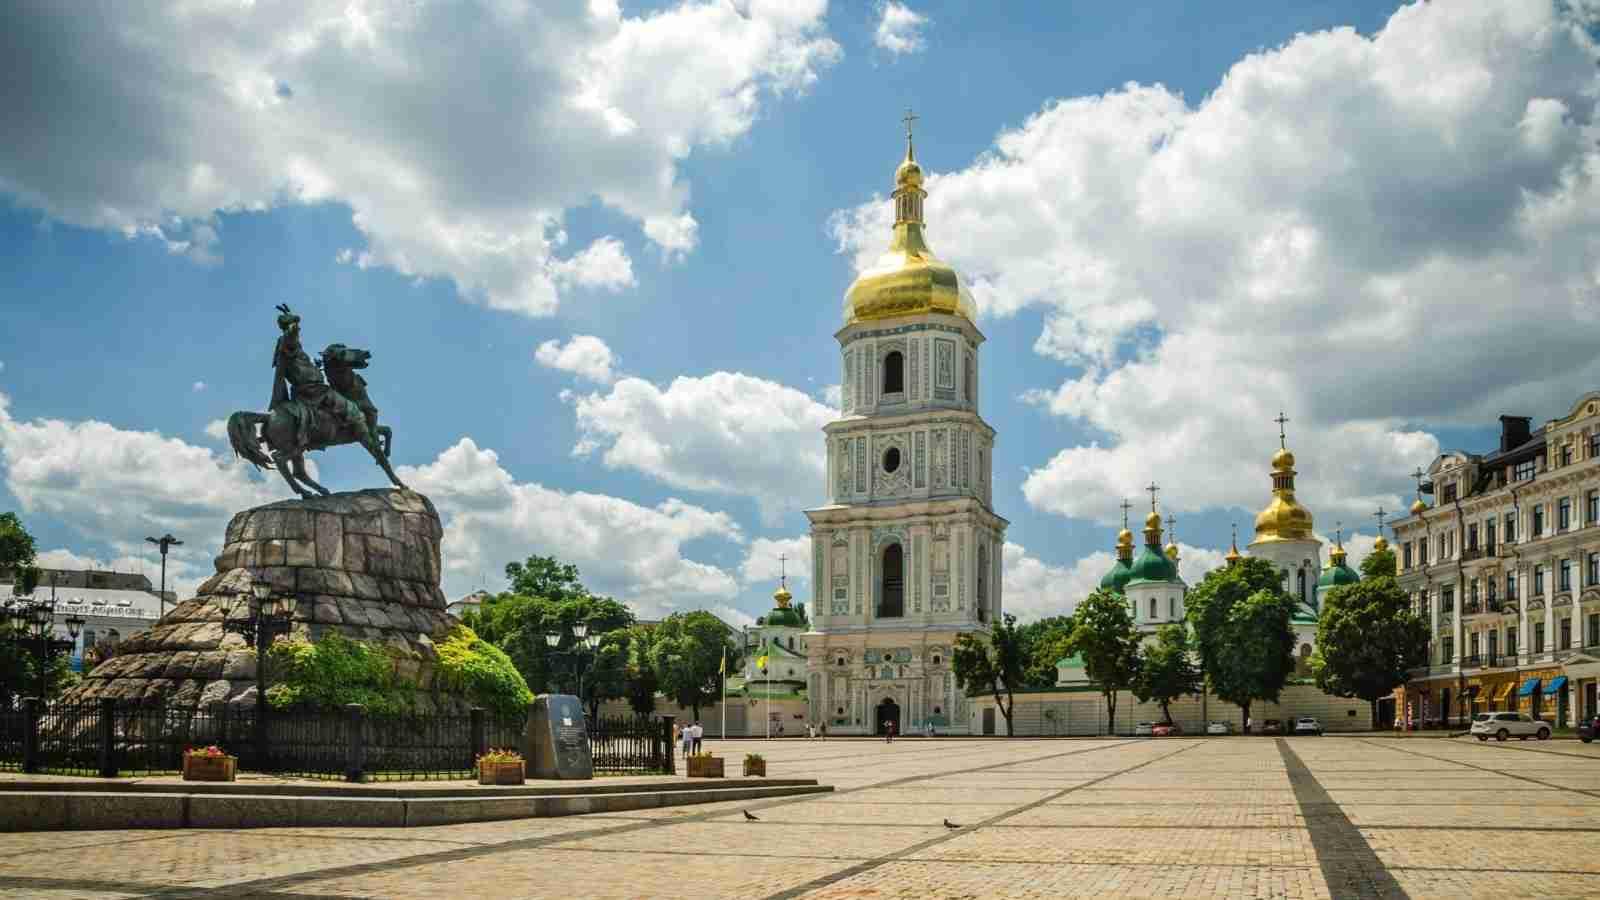 ukraine-kiev-sofias-square-1600x900